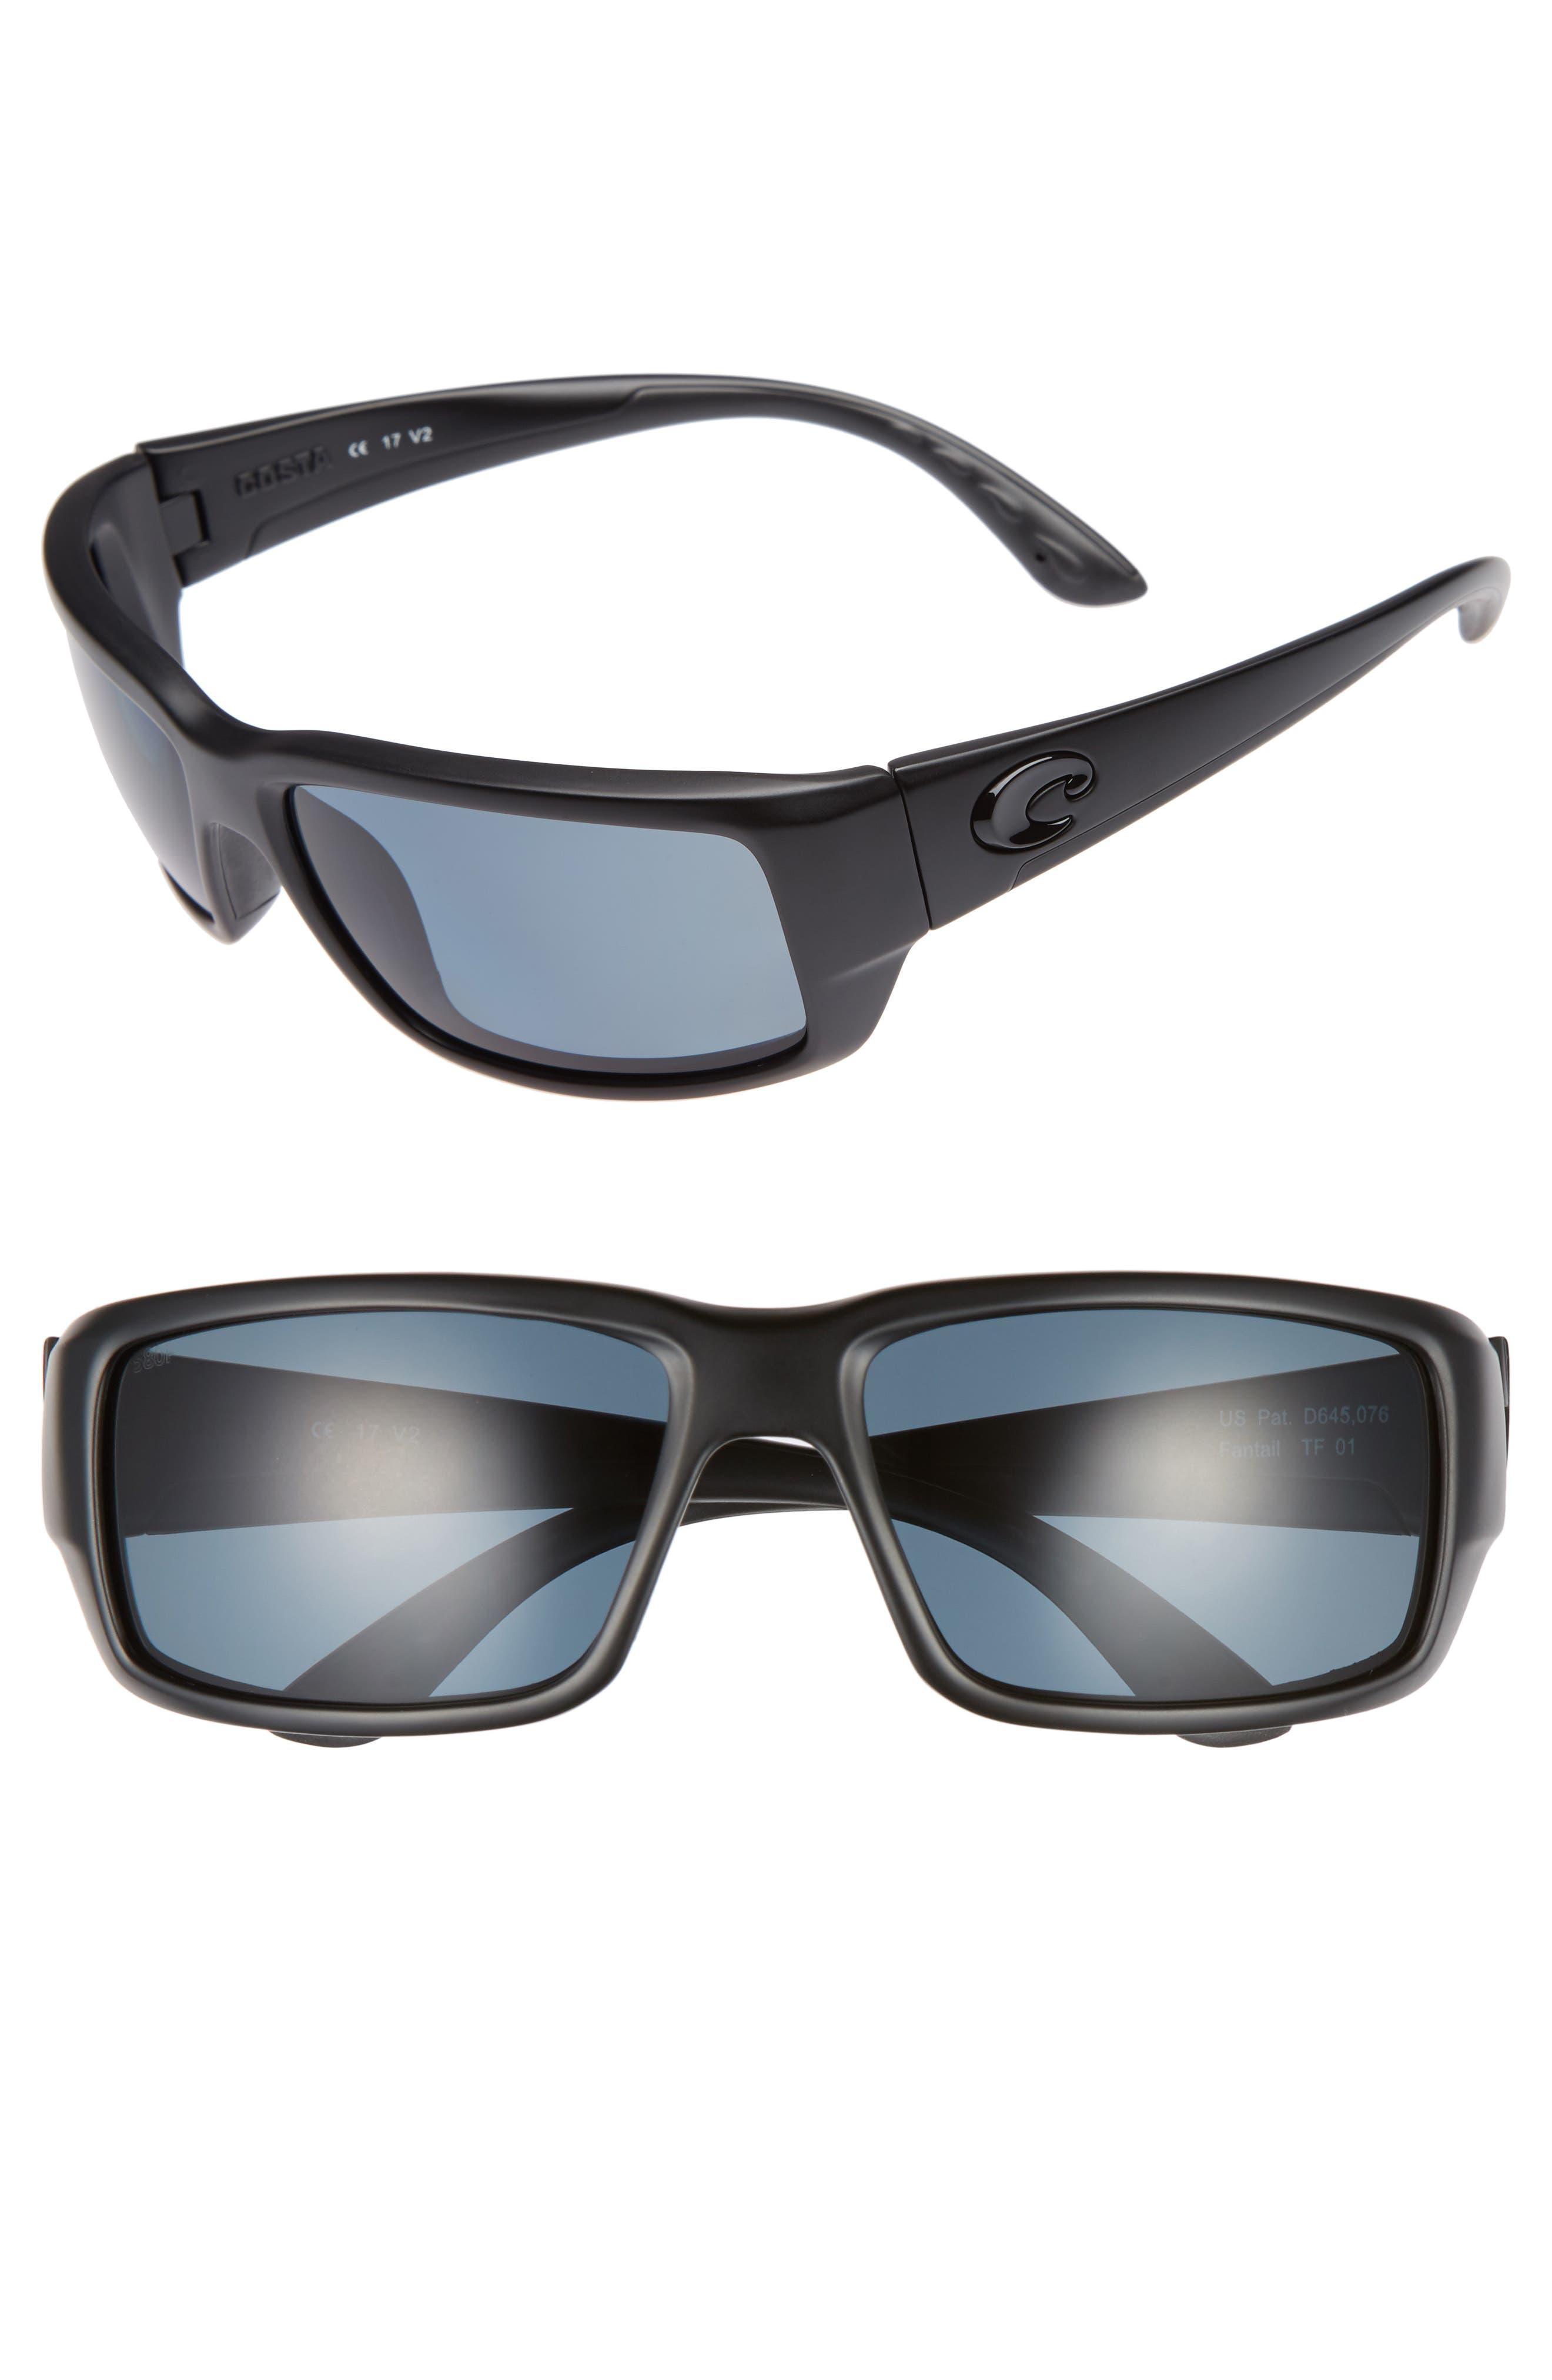 Fantail 60mm Polarized Sunglasses,                         Main,                         color, 001